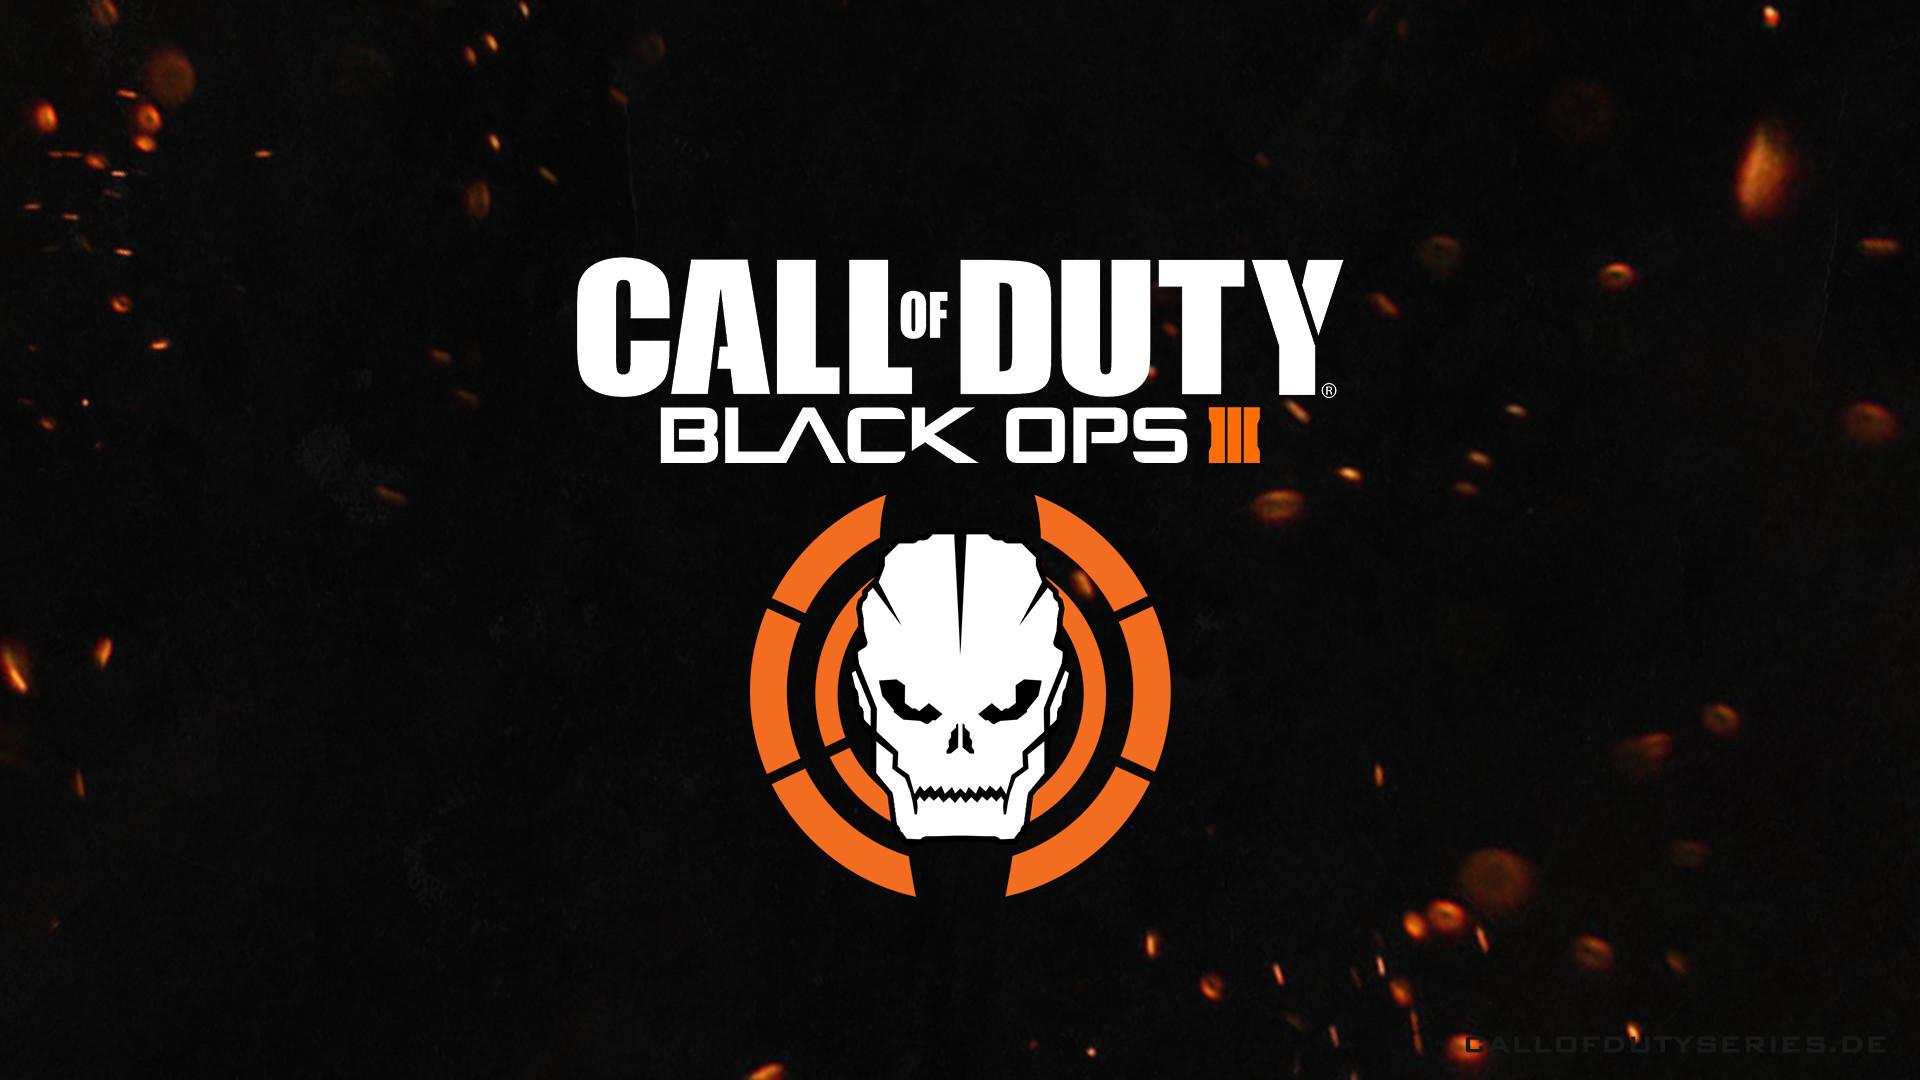 Call Of Duty Black Ops 4 Wallpaper 1920x1080 Download Wallpaper